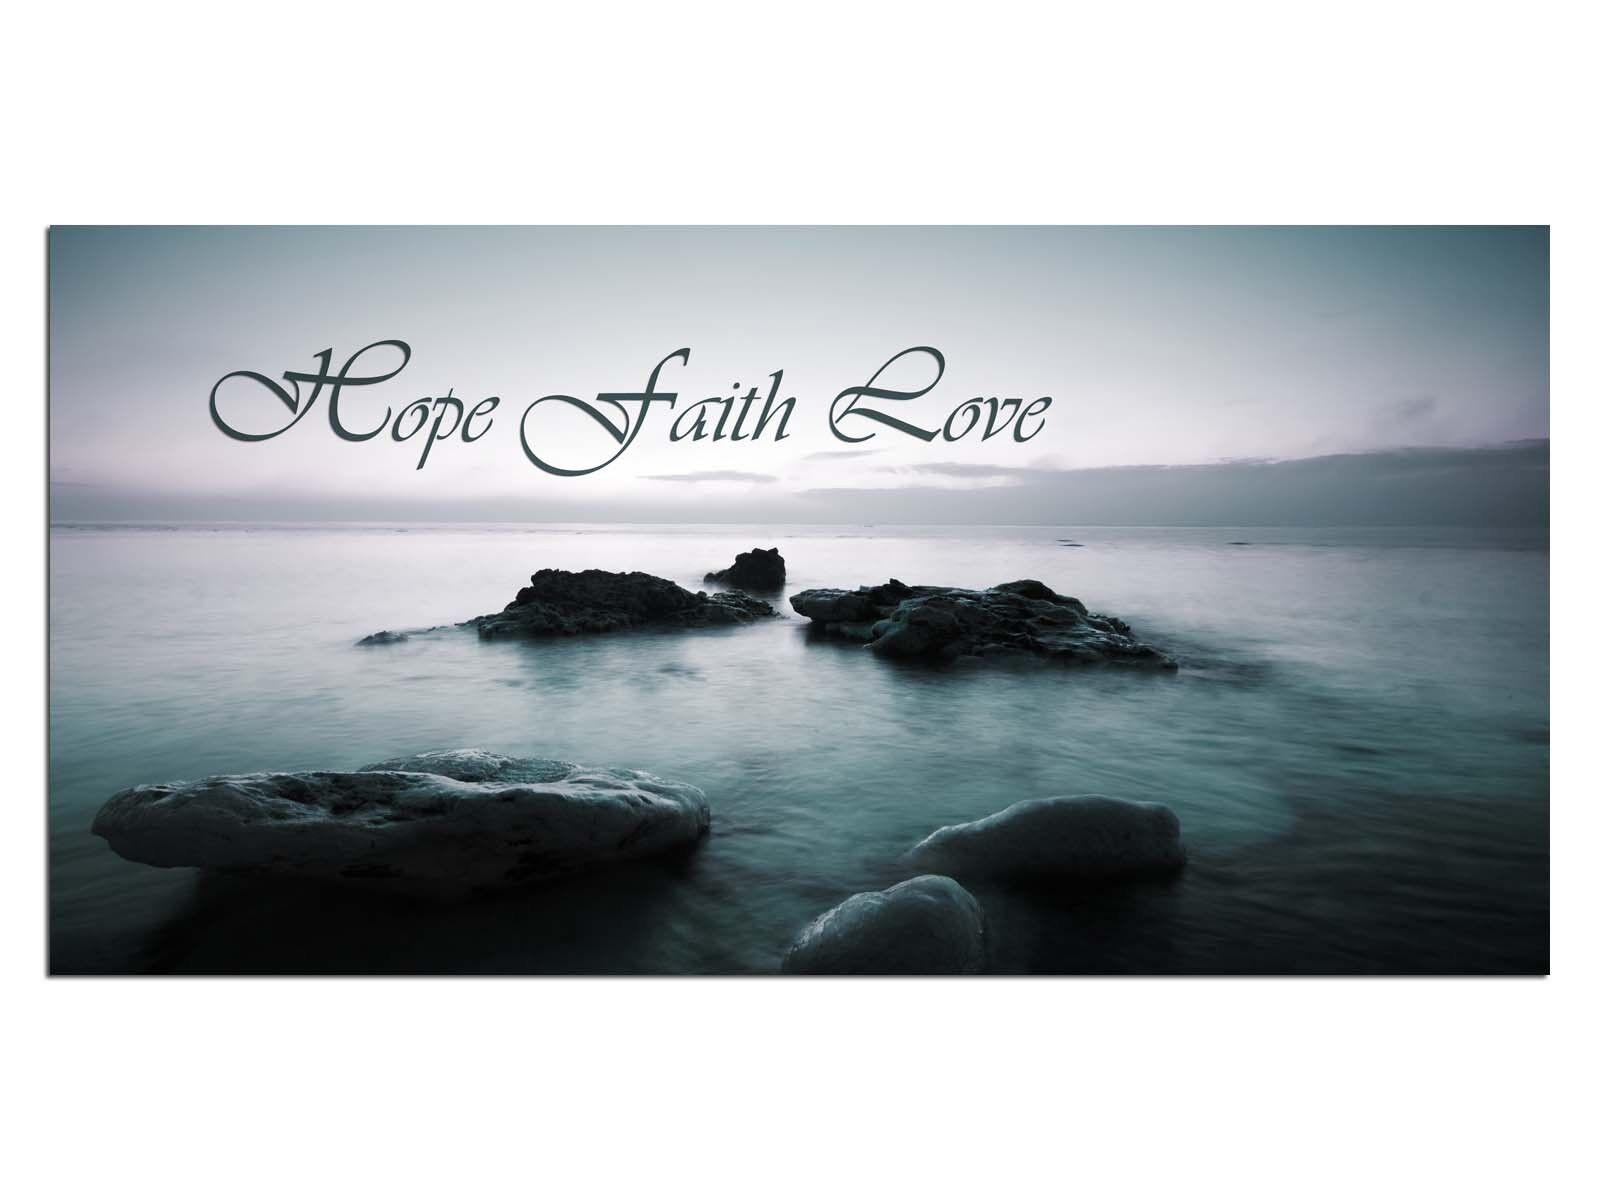 Deco De Vidrio Imagen eg4100500816 stonebeach océano Spruch me Tamaño 39,37  X 19,68  H